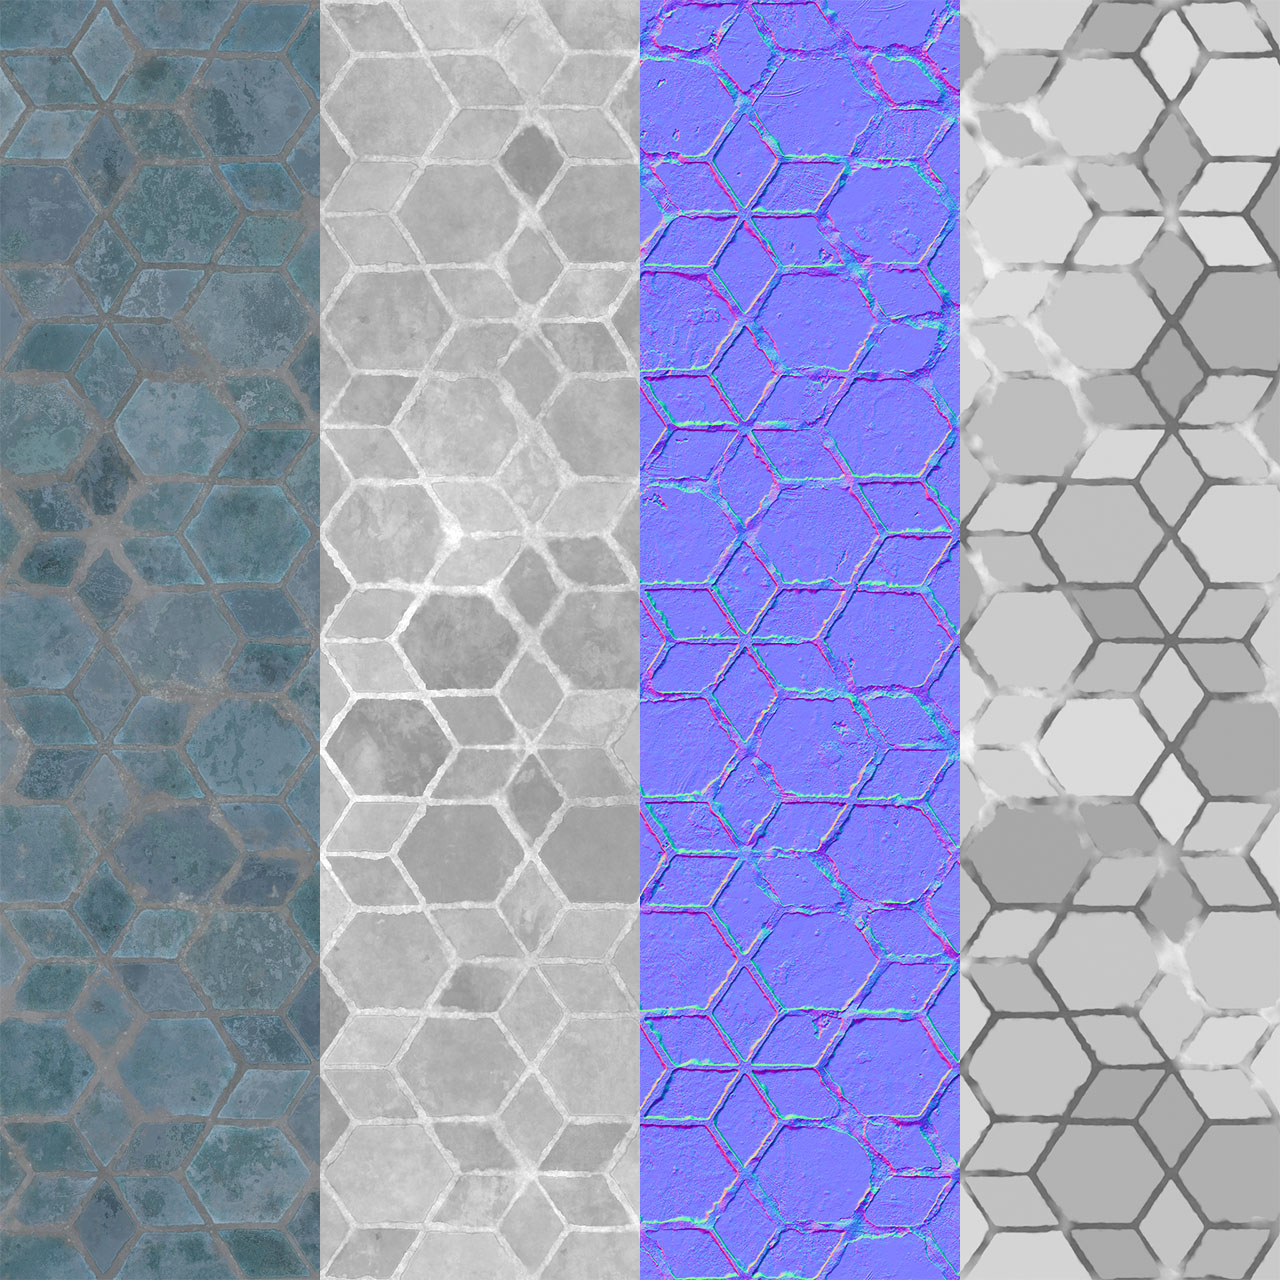 HexagonTIles_Maps_02.jpg